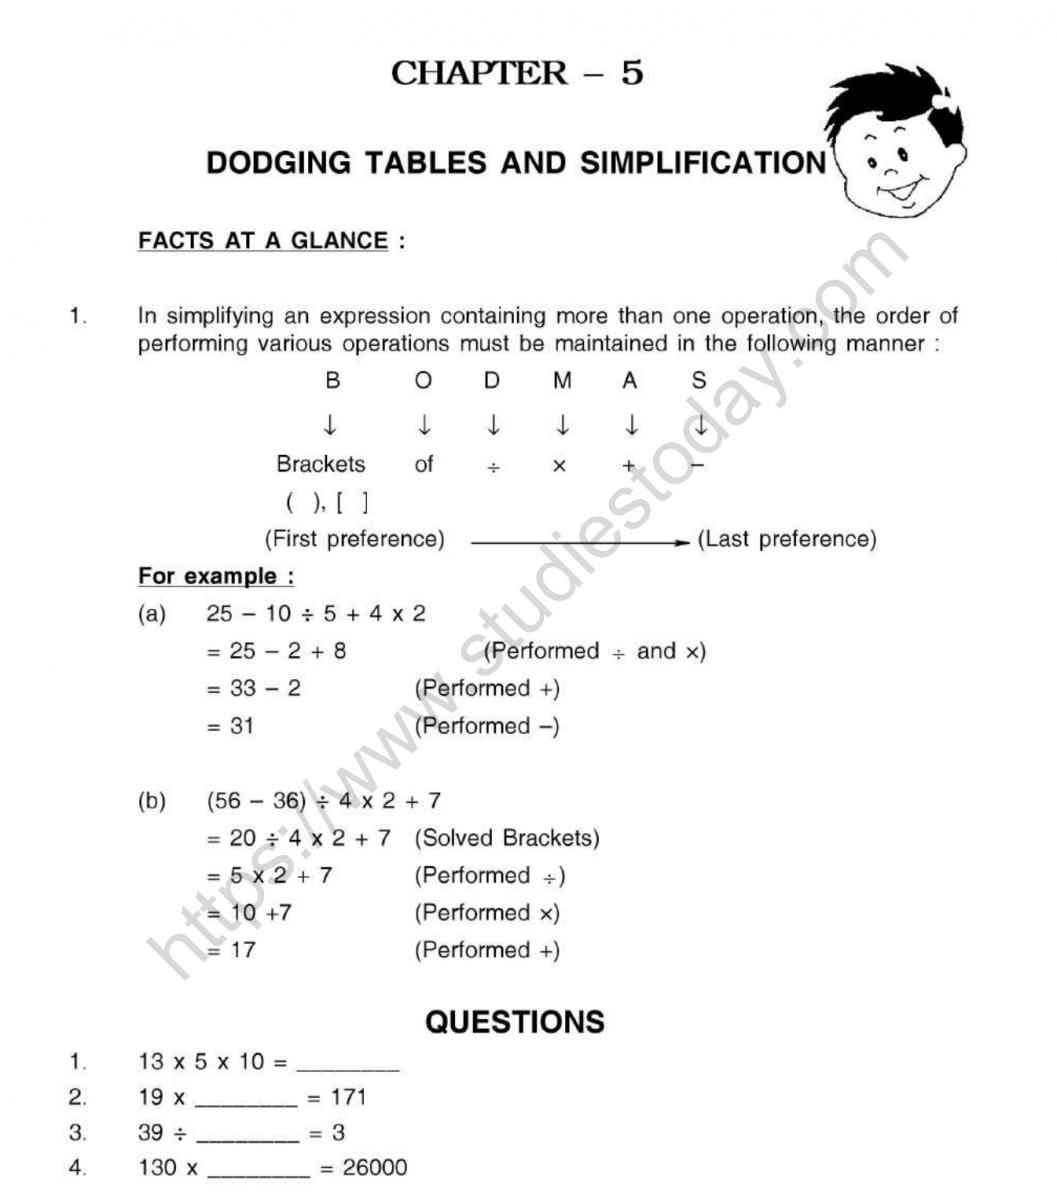 Cbse Class 5 Mental Maths Dodging Tables And